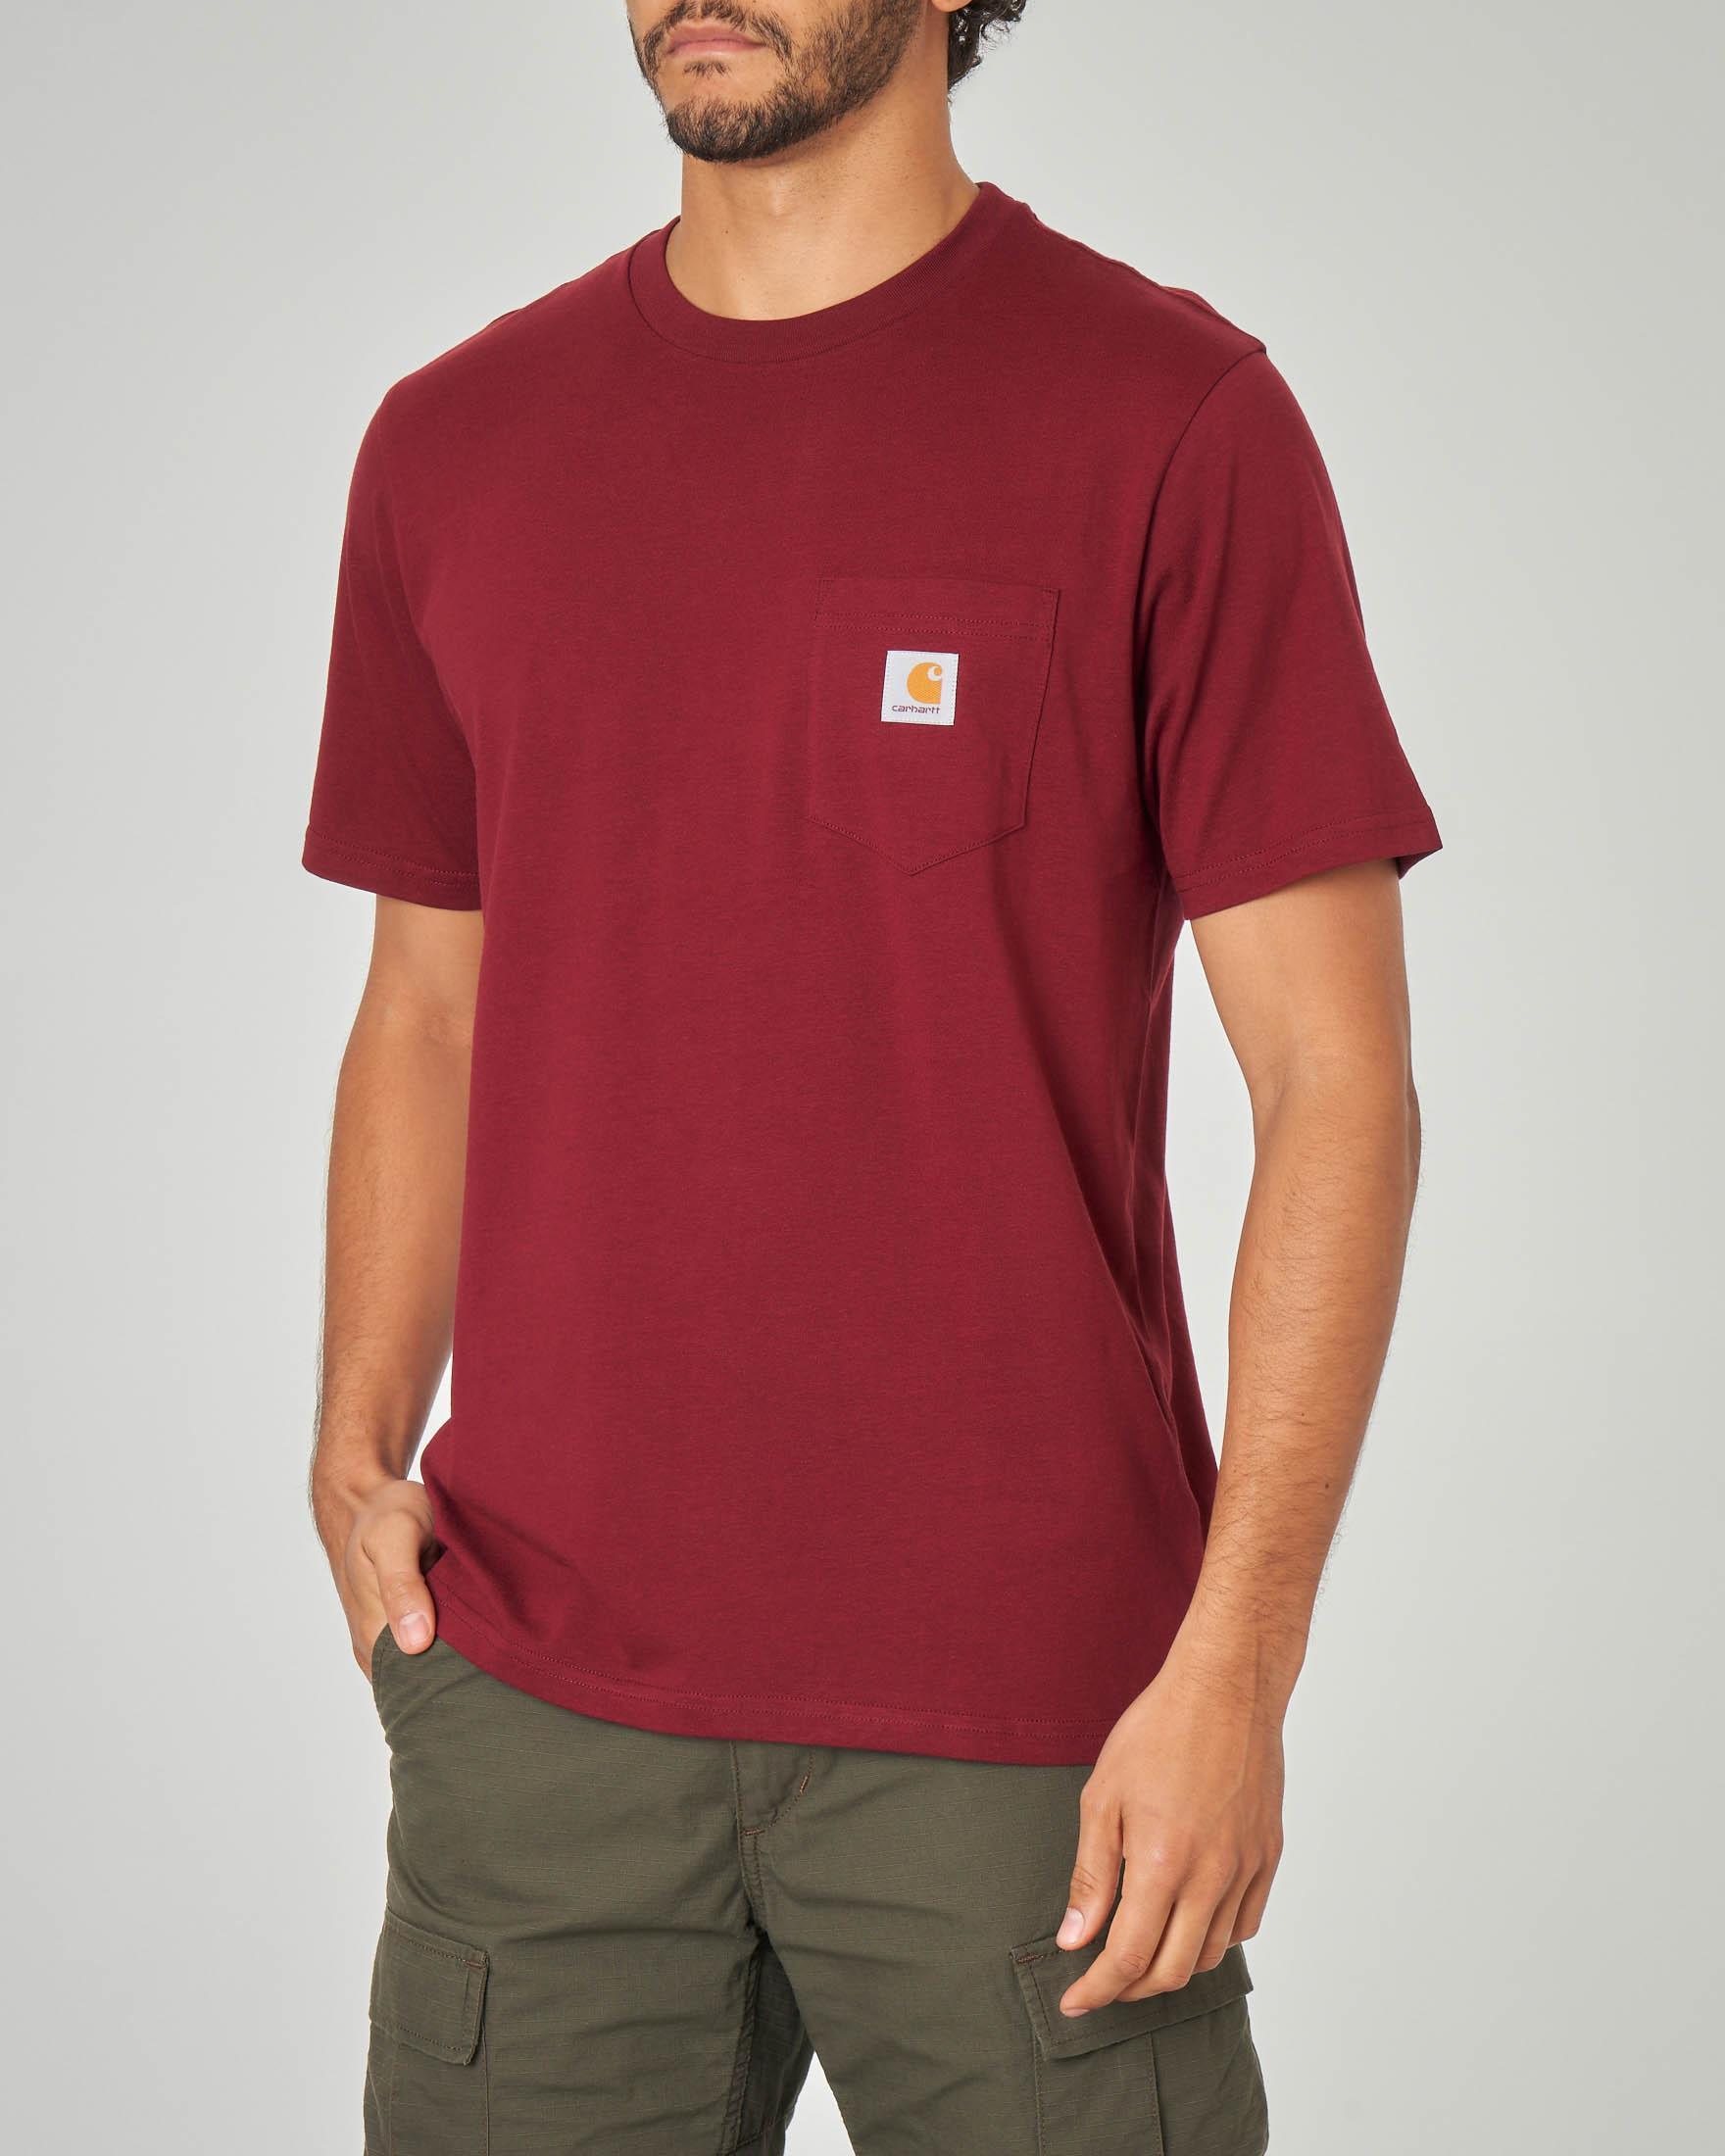 T-shirt bordeaux con taschino